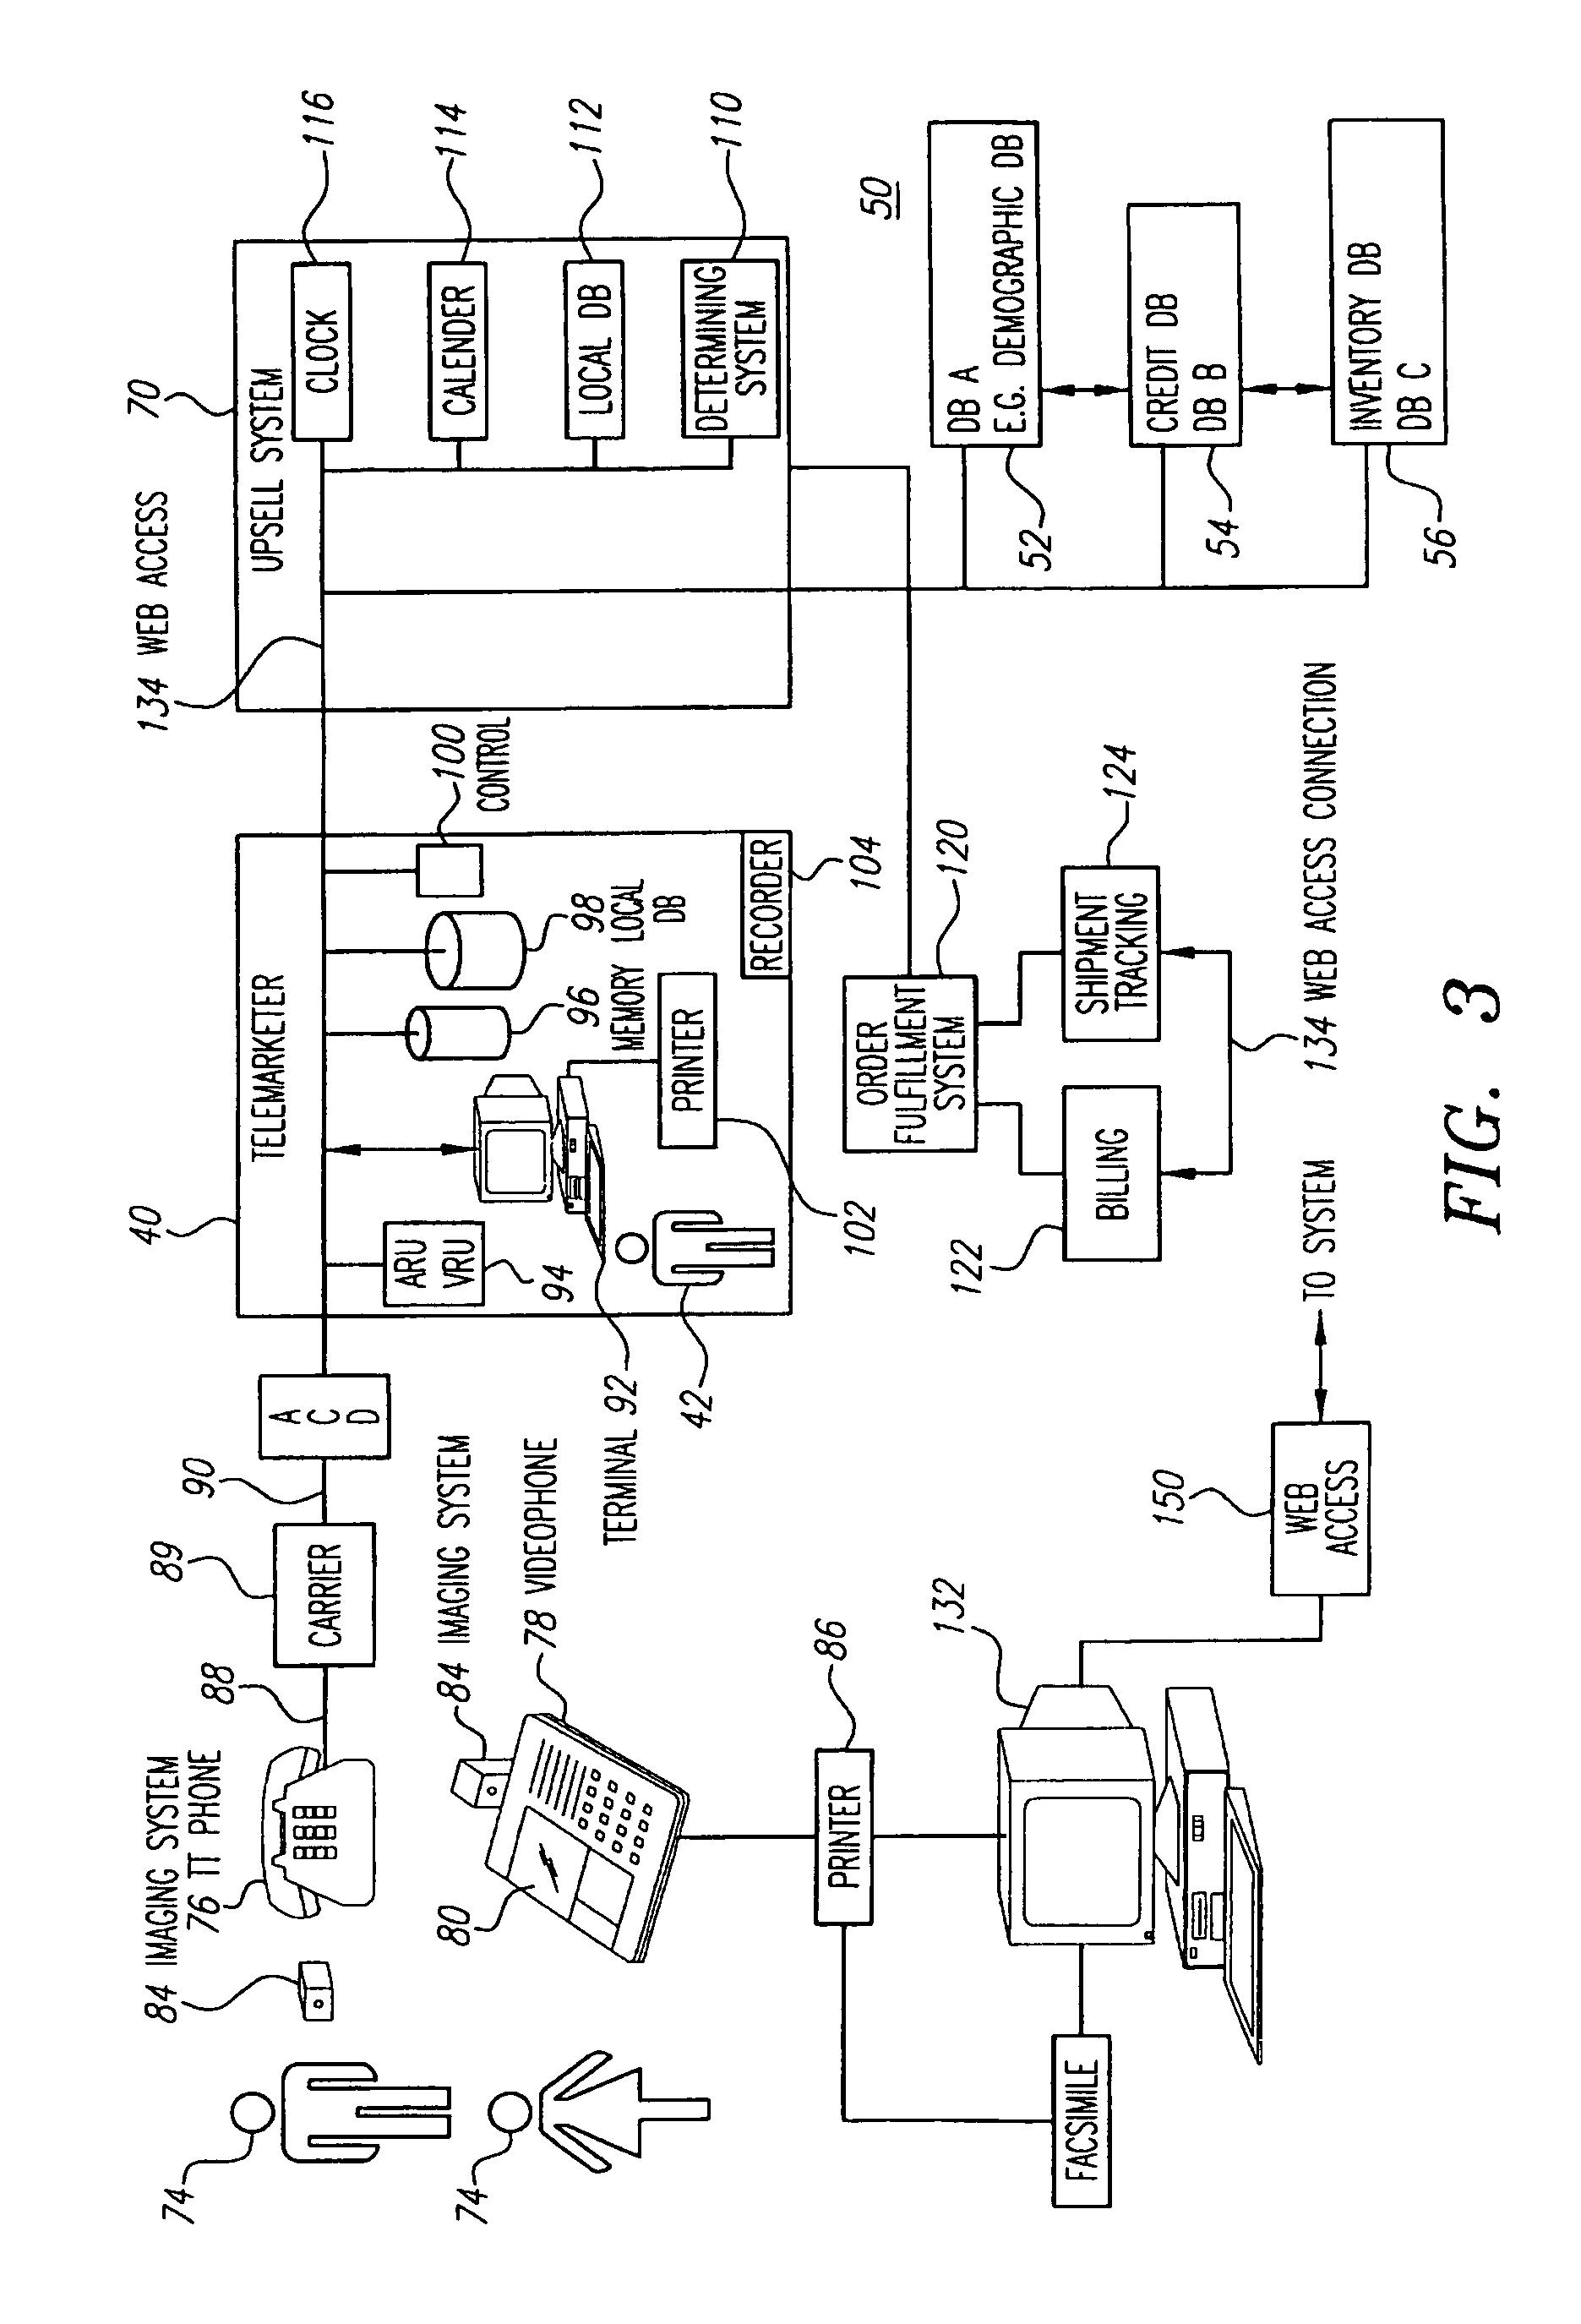 peugeot xps sm wiring diagram